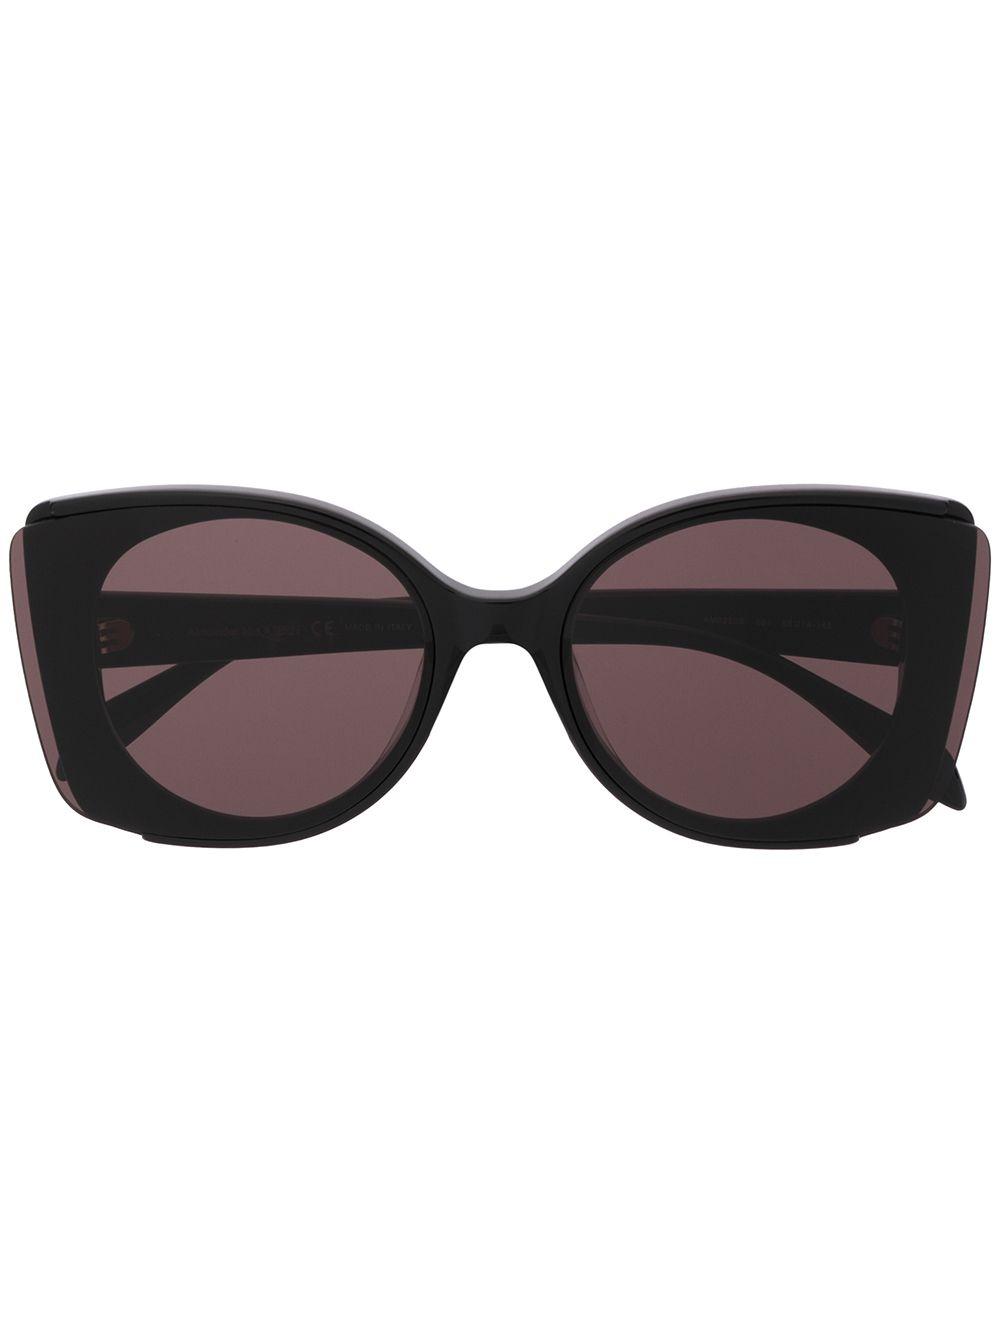 Am0250s Sunglasses